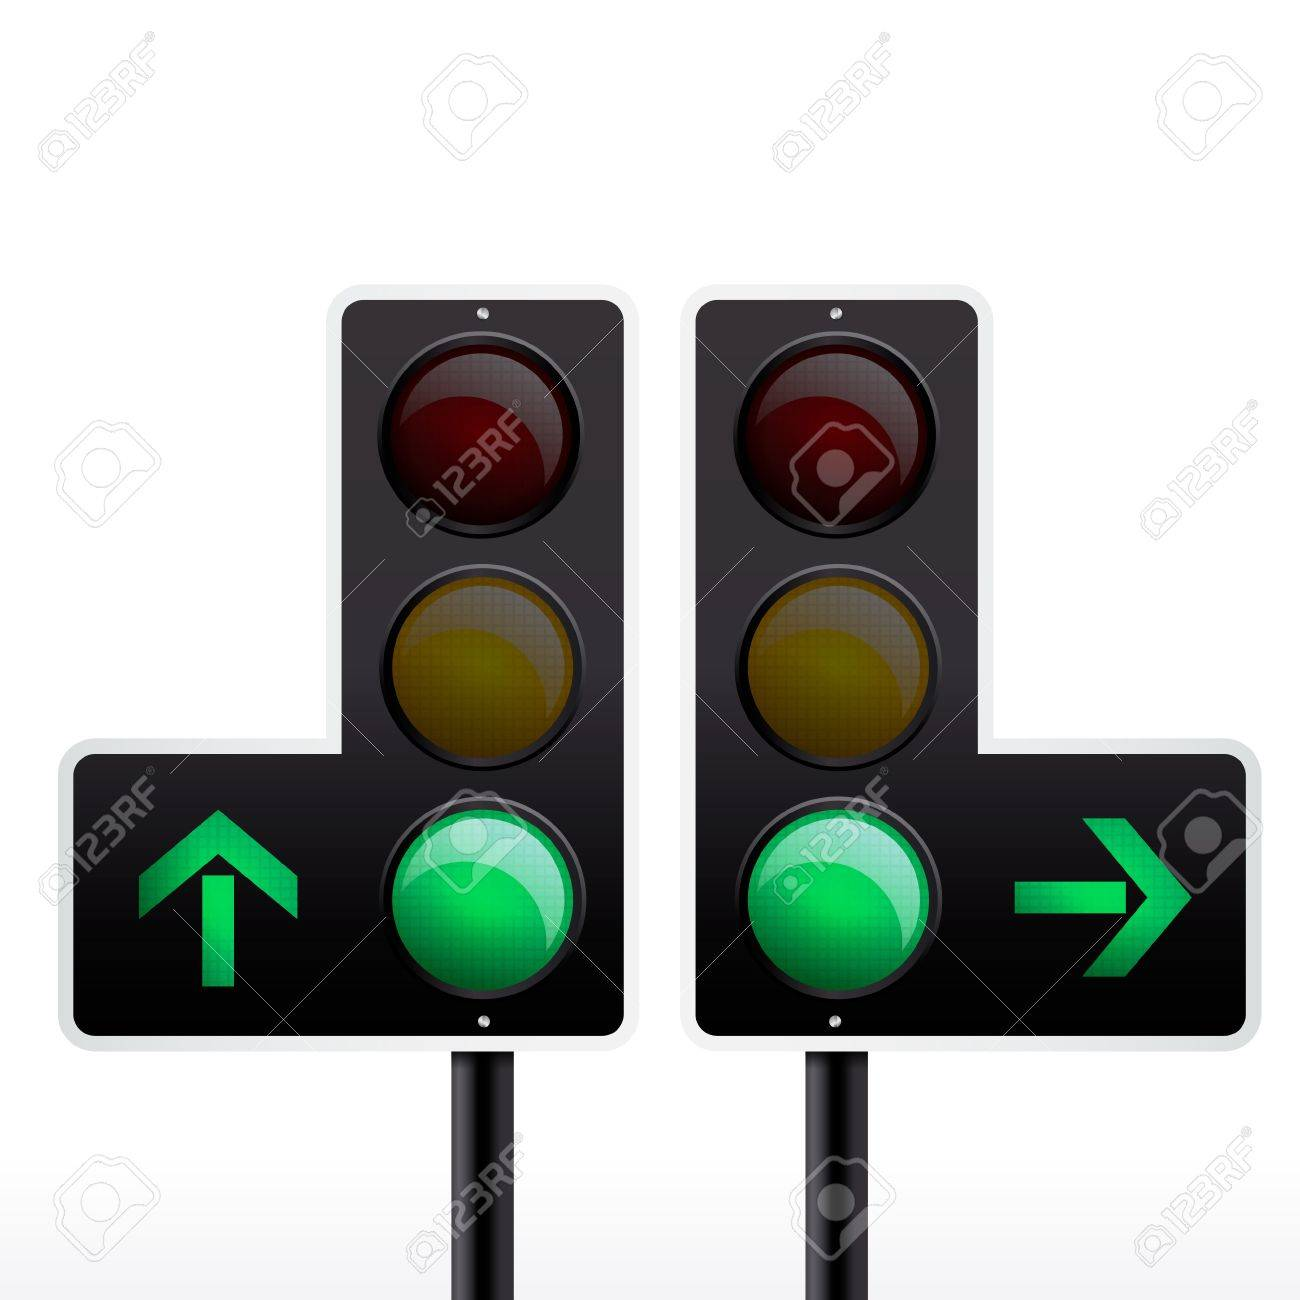 Isolated traffic light vector Stock Vector - 12497792